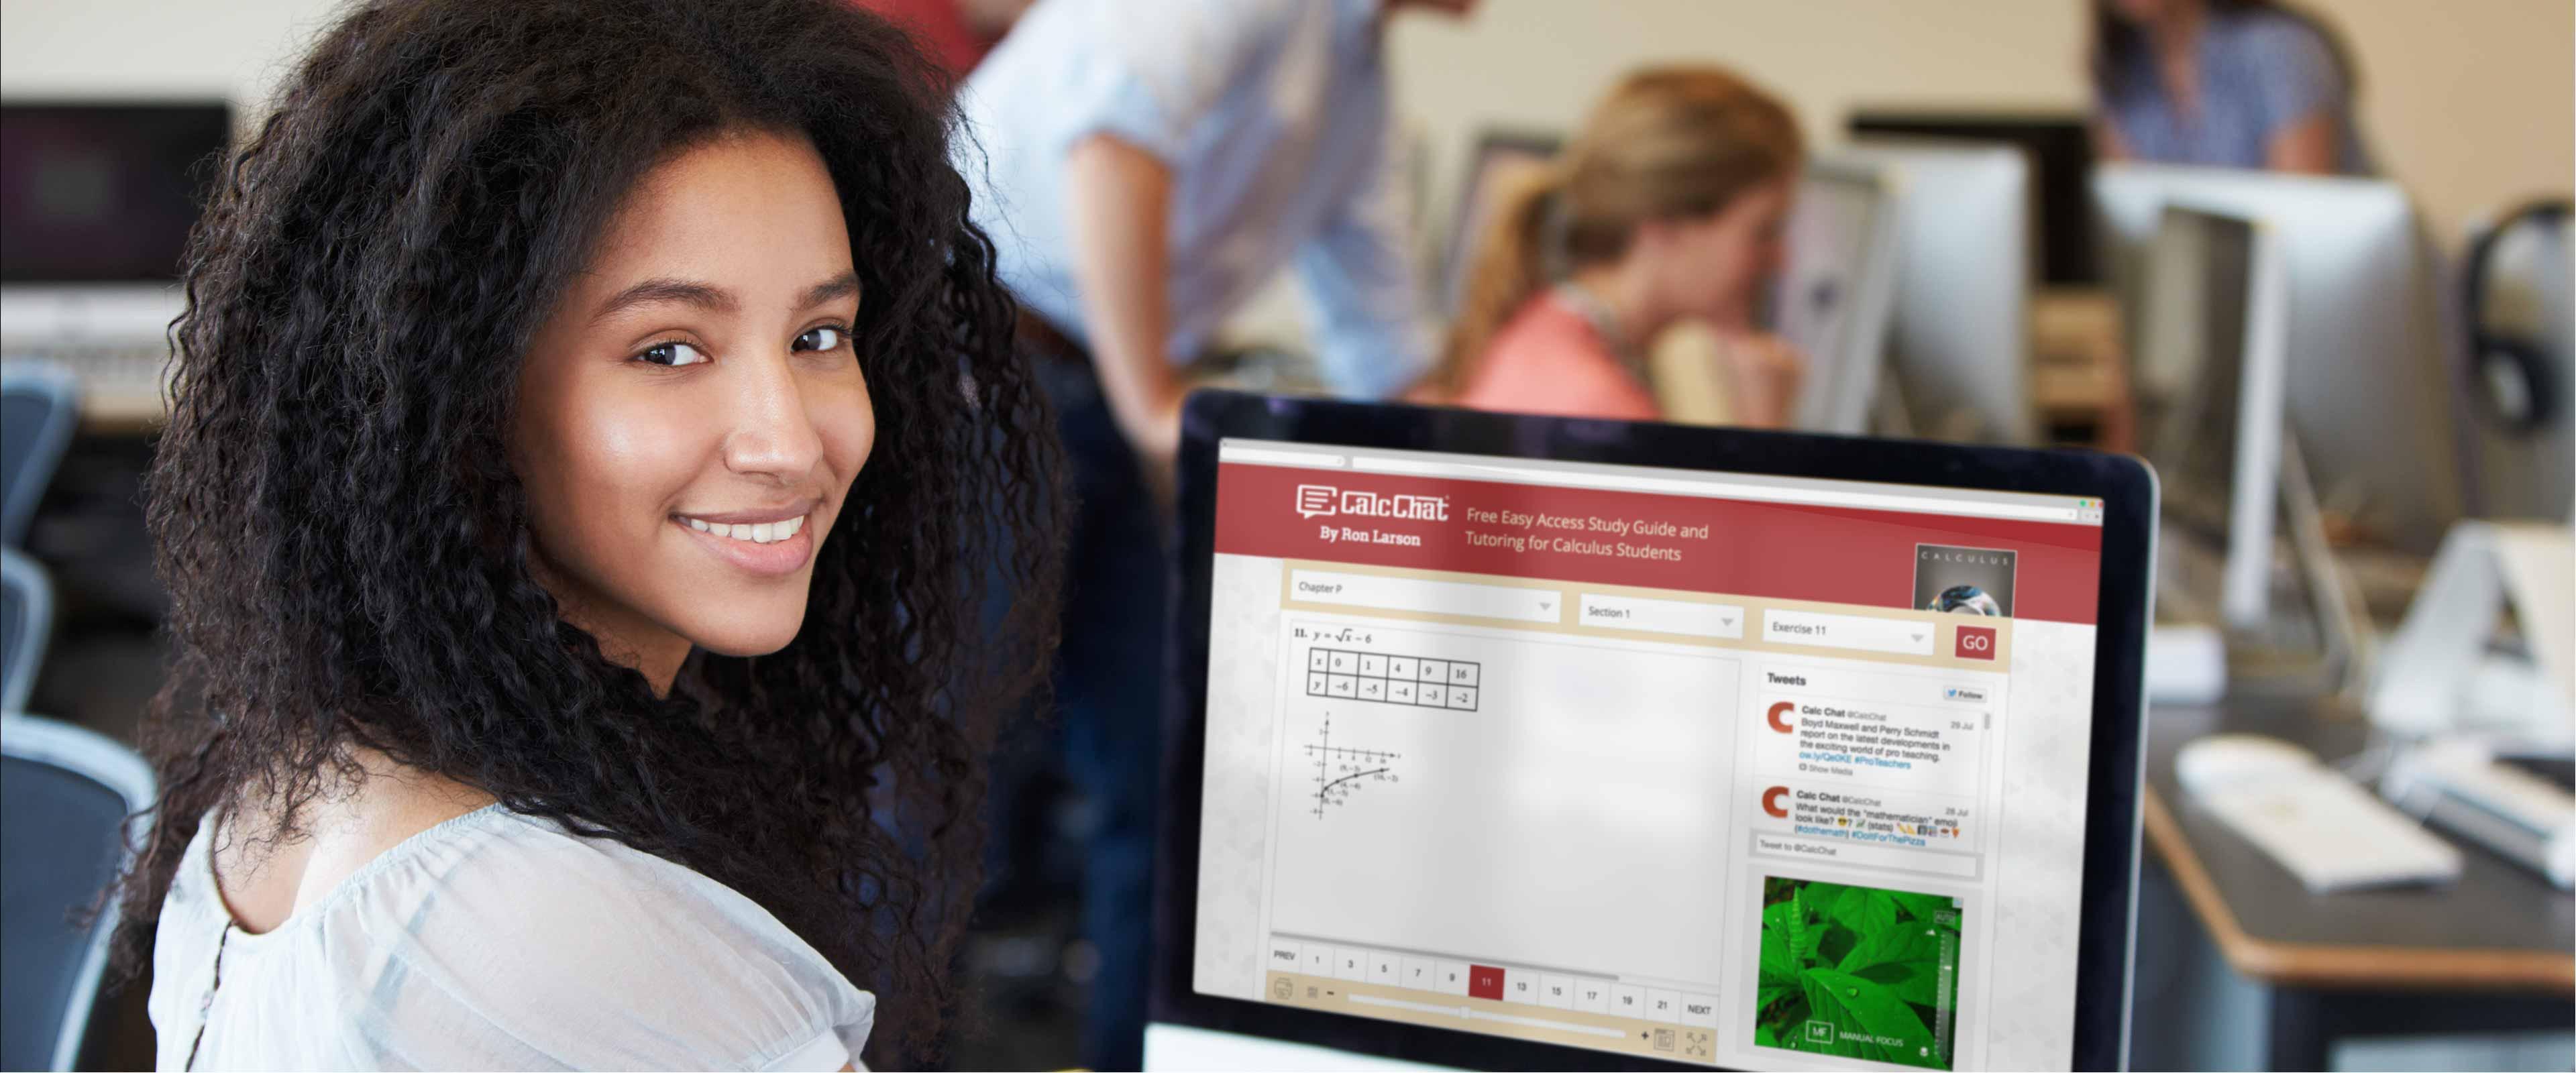 Larson Calculus – Calculus 10e | Easy Access Study Guide